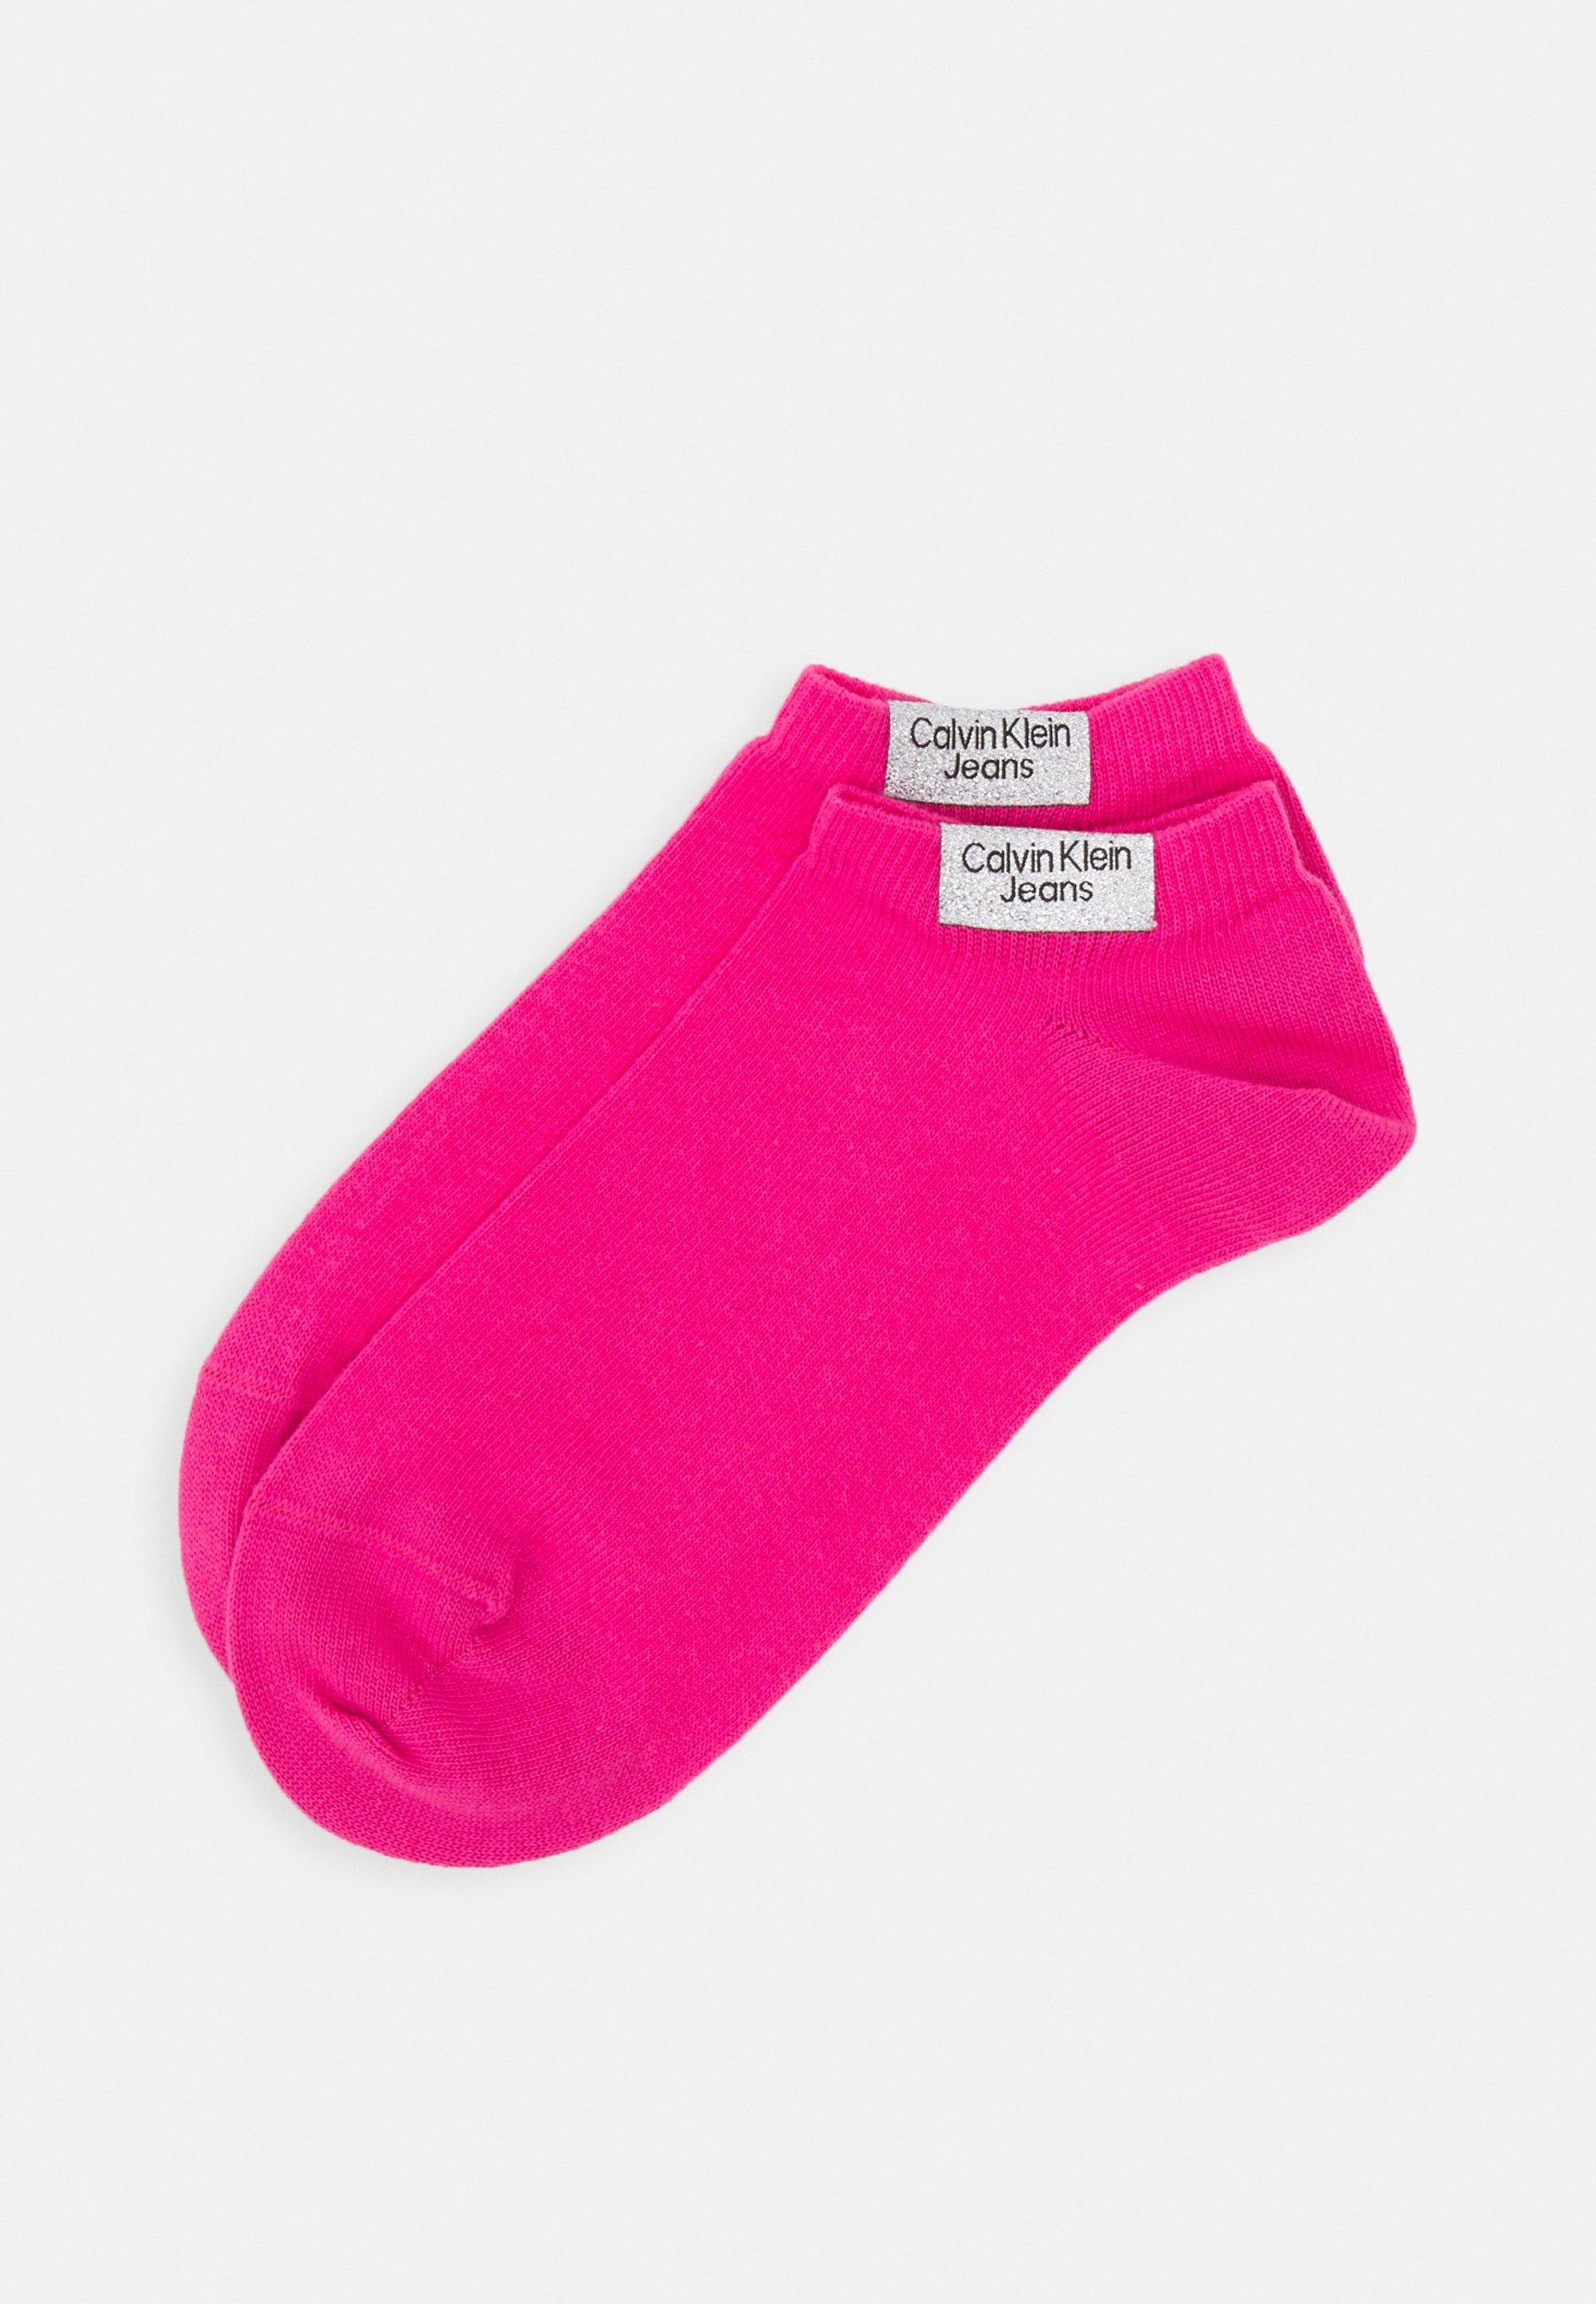 Femme WOMEN SNEAKER PATCH 2 PACK - Chaussettes